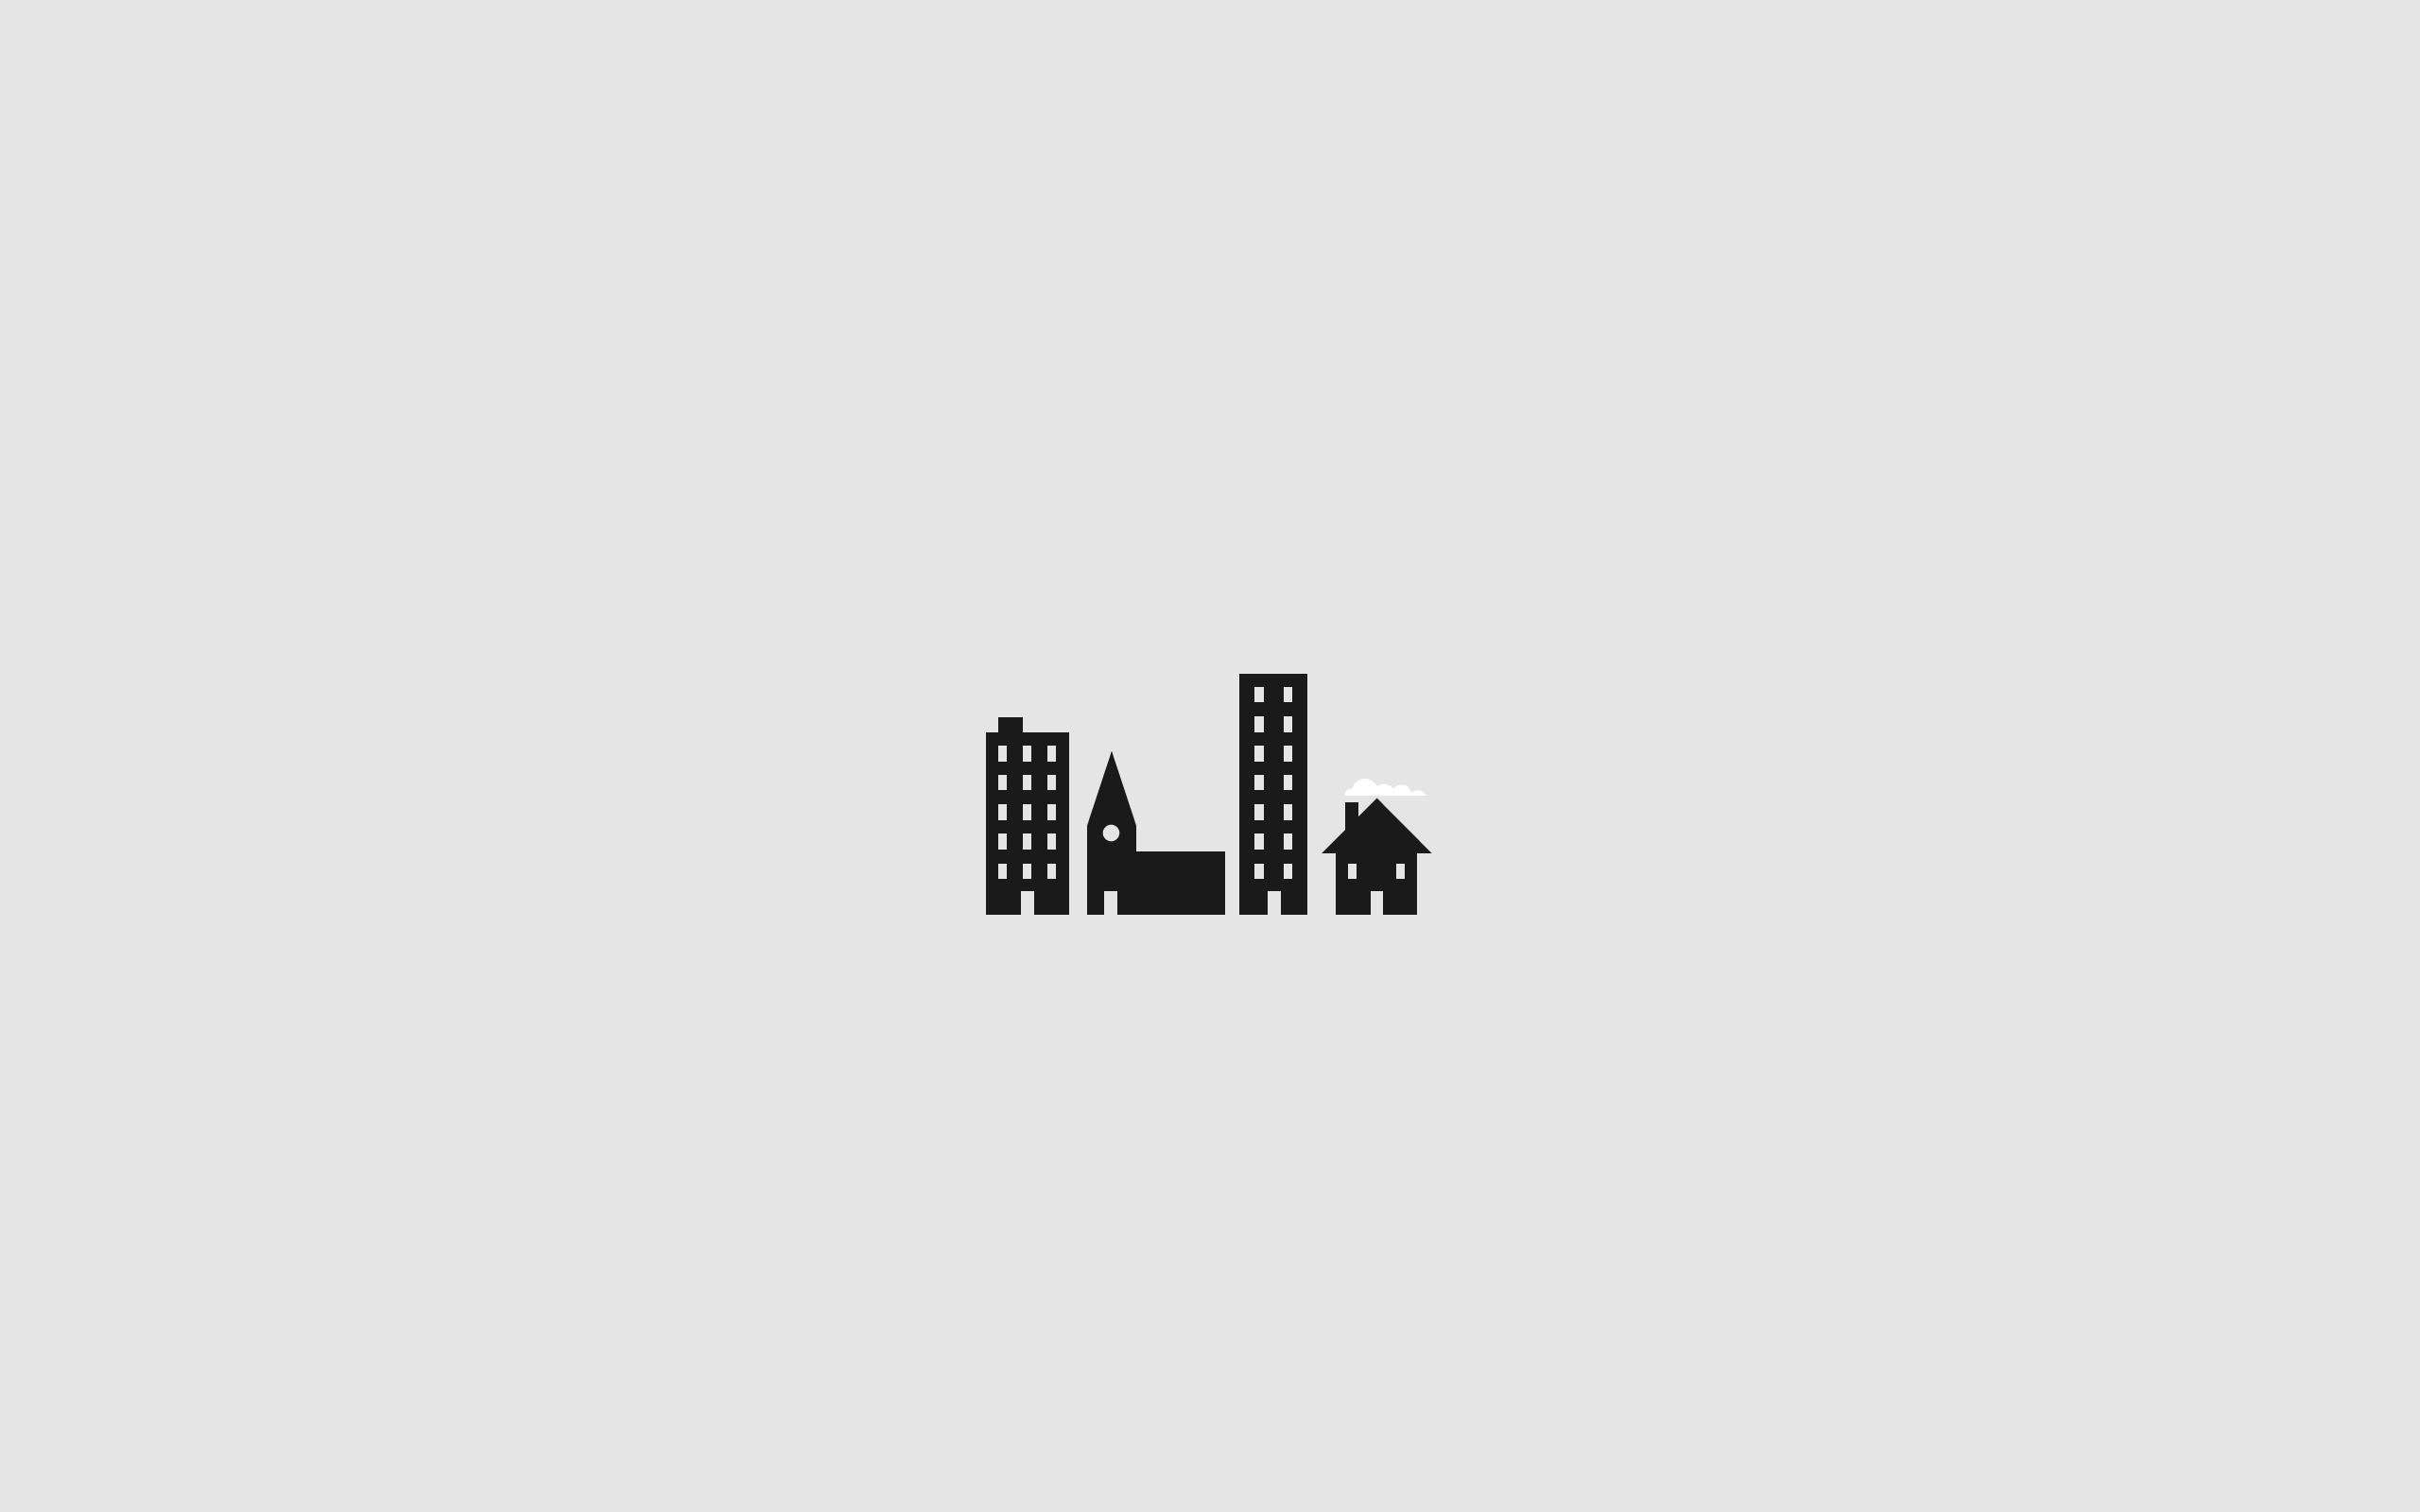 minimalist backgrounds 11 2560 x 1600